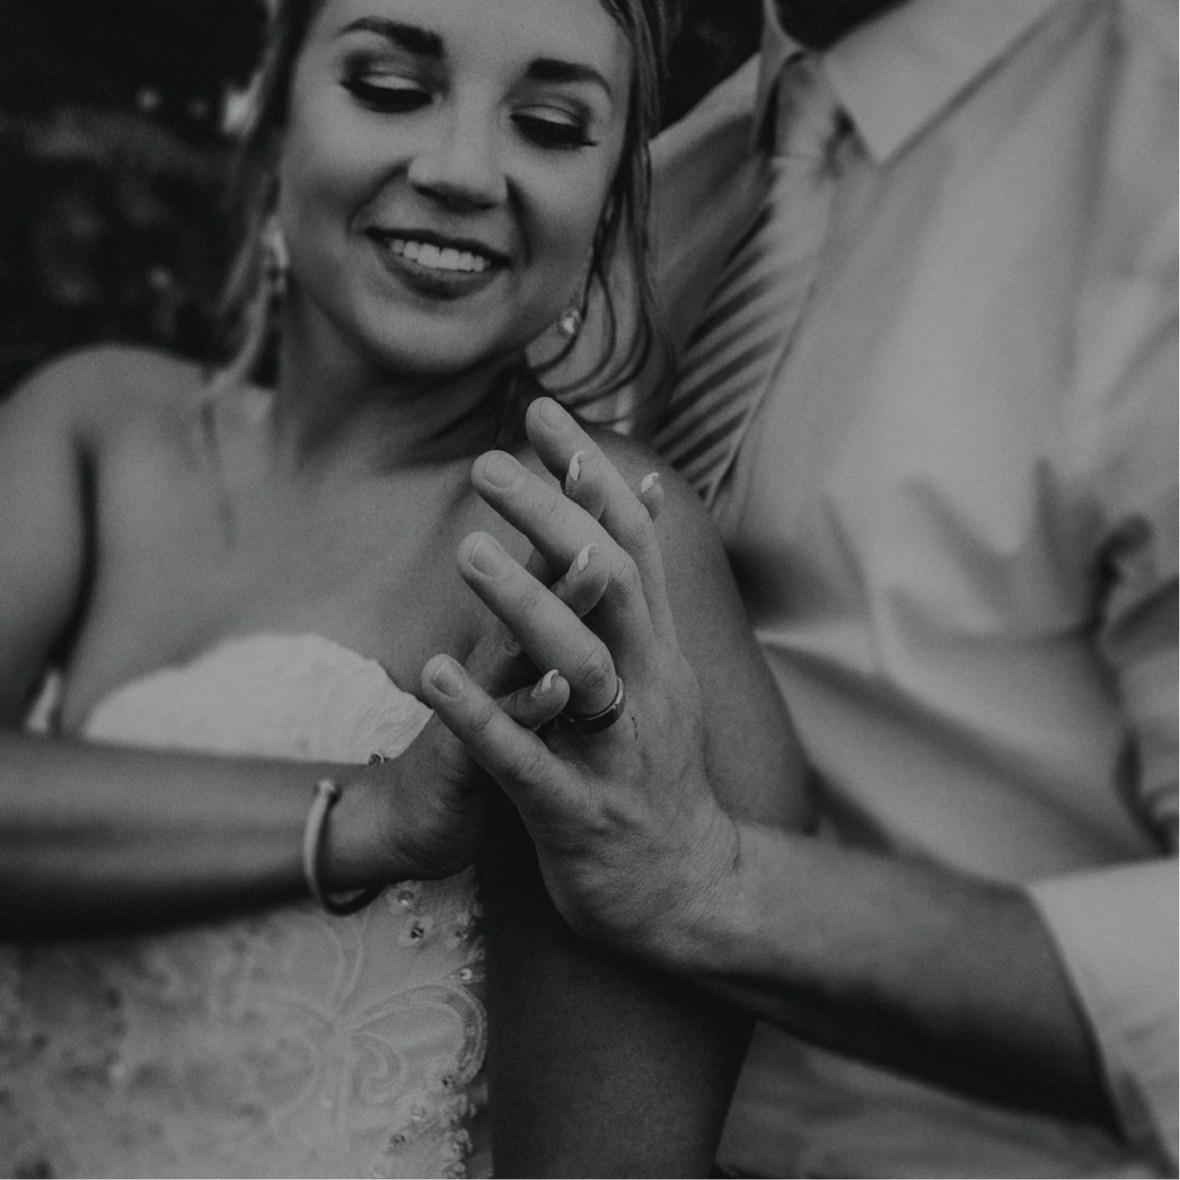 43_WCTM0588-Editabwb_oldham_Rustic_Summer_County_Kentucky_Wedding_Grange_La_Crestwood